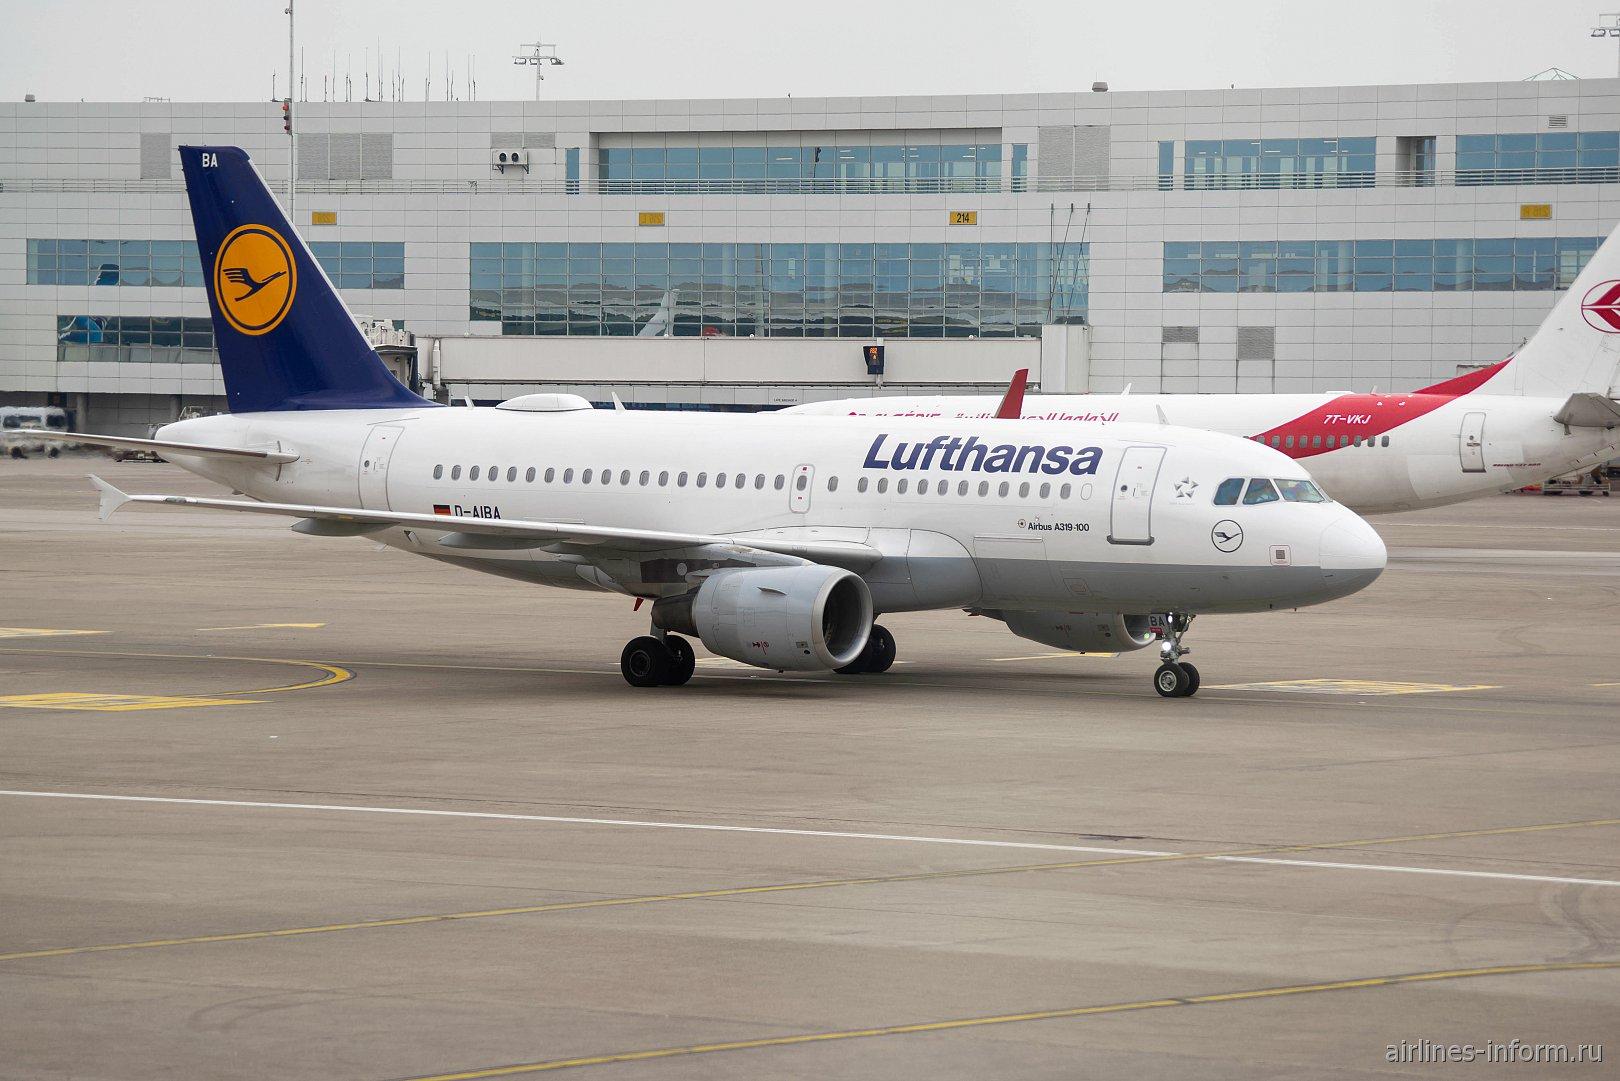 Airbus A319 D-AIBA авиакомпании Lufthansa в аэропорту Брюсселя